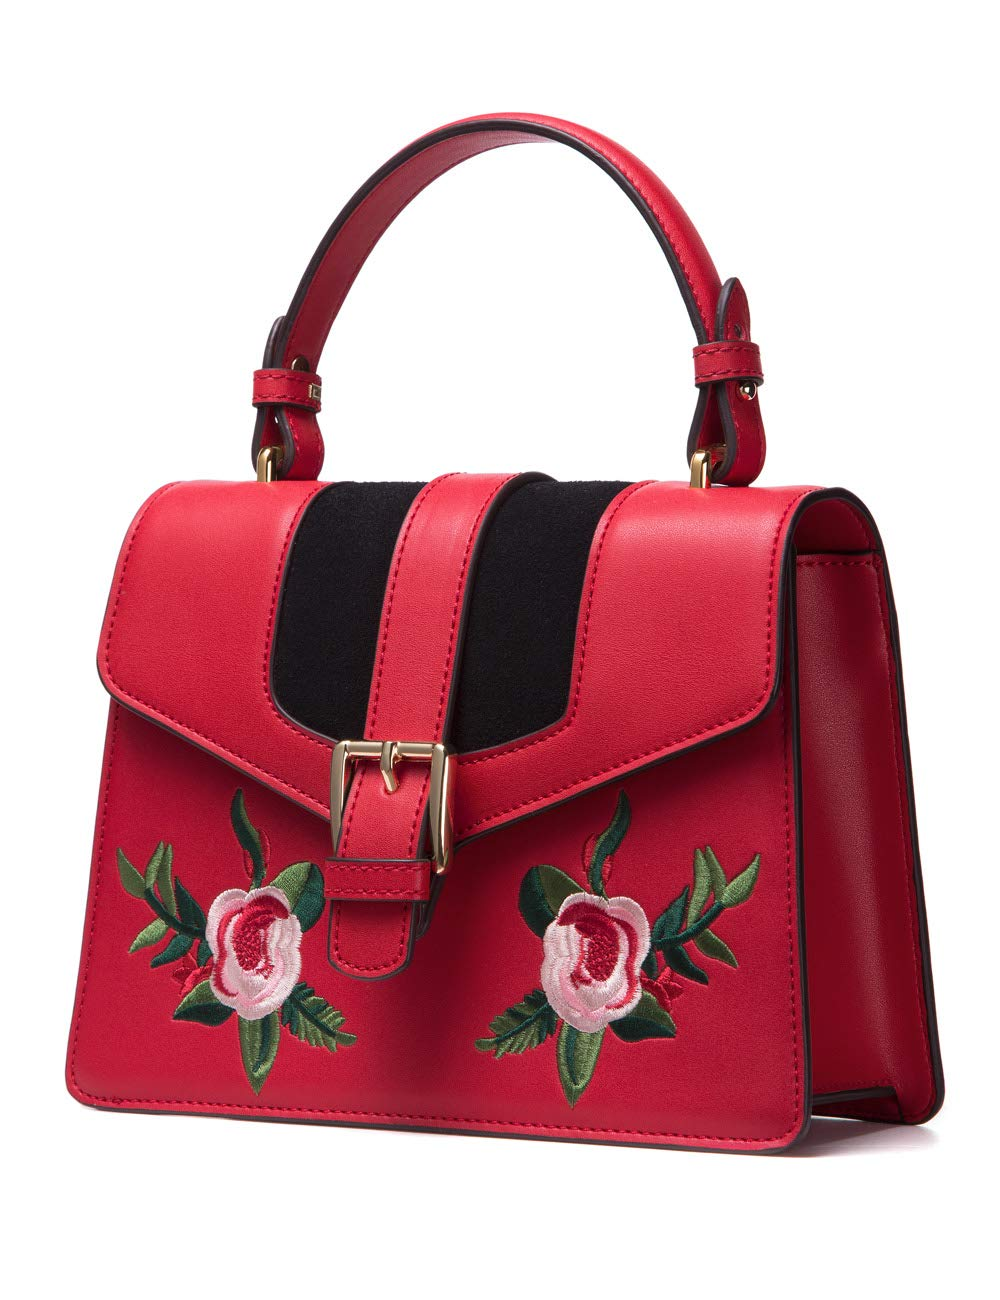 LA'FESTIN Womens Crossbody Handbags Embroidered Retro Shoulder Bag Leather Red Purse